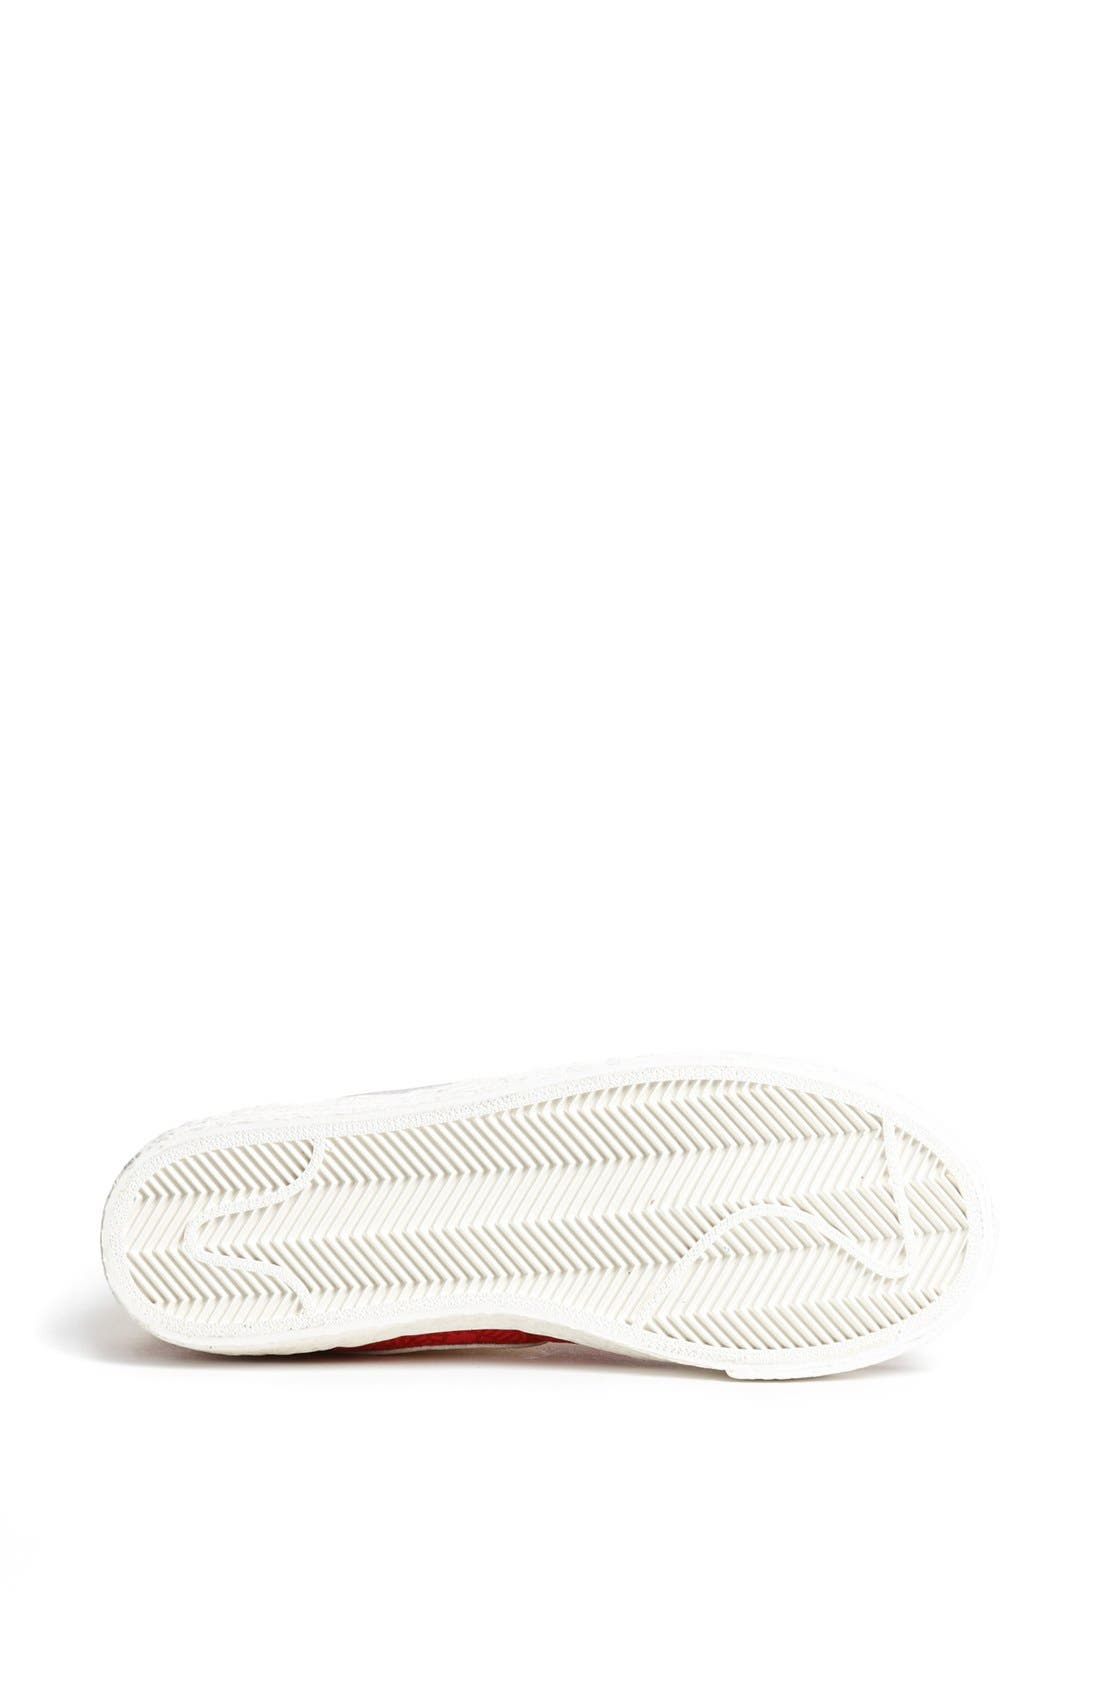 Alternate Image 3  - Nike 'Blazer Mid - Year of the Horse' Sneaker (Women)